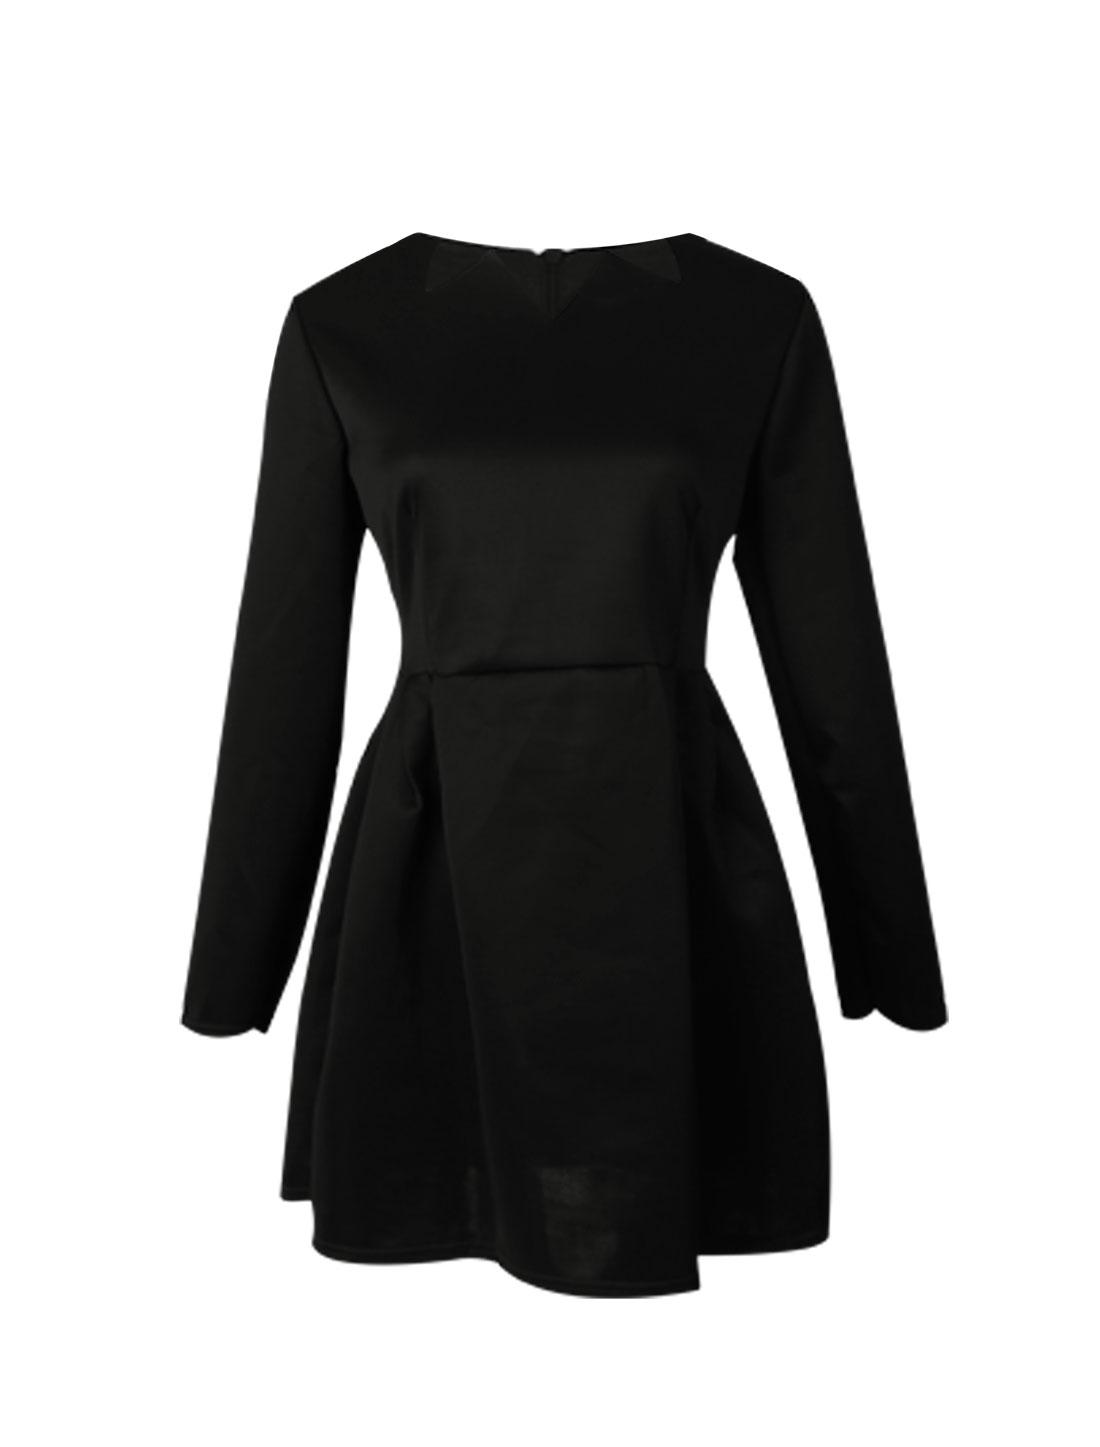 Women Scalloped Neckline Long Sleeve A-line Dress Black M